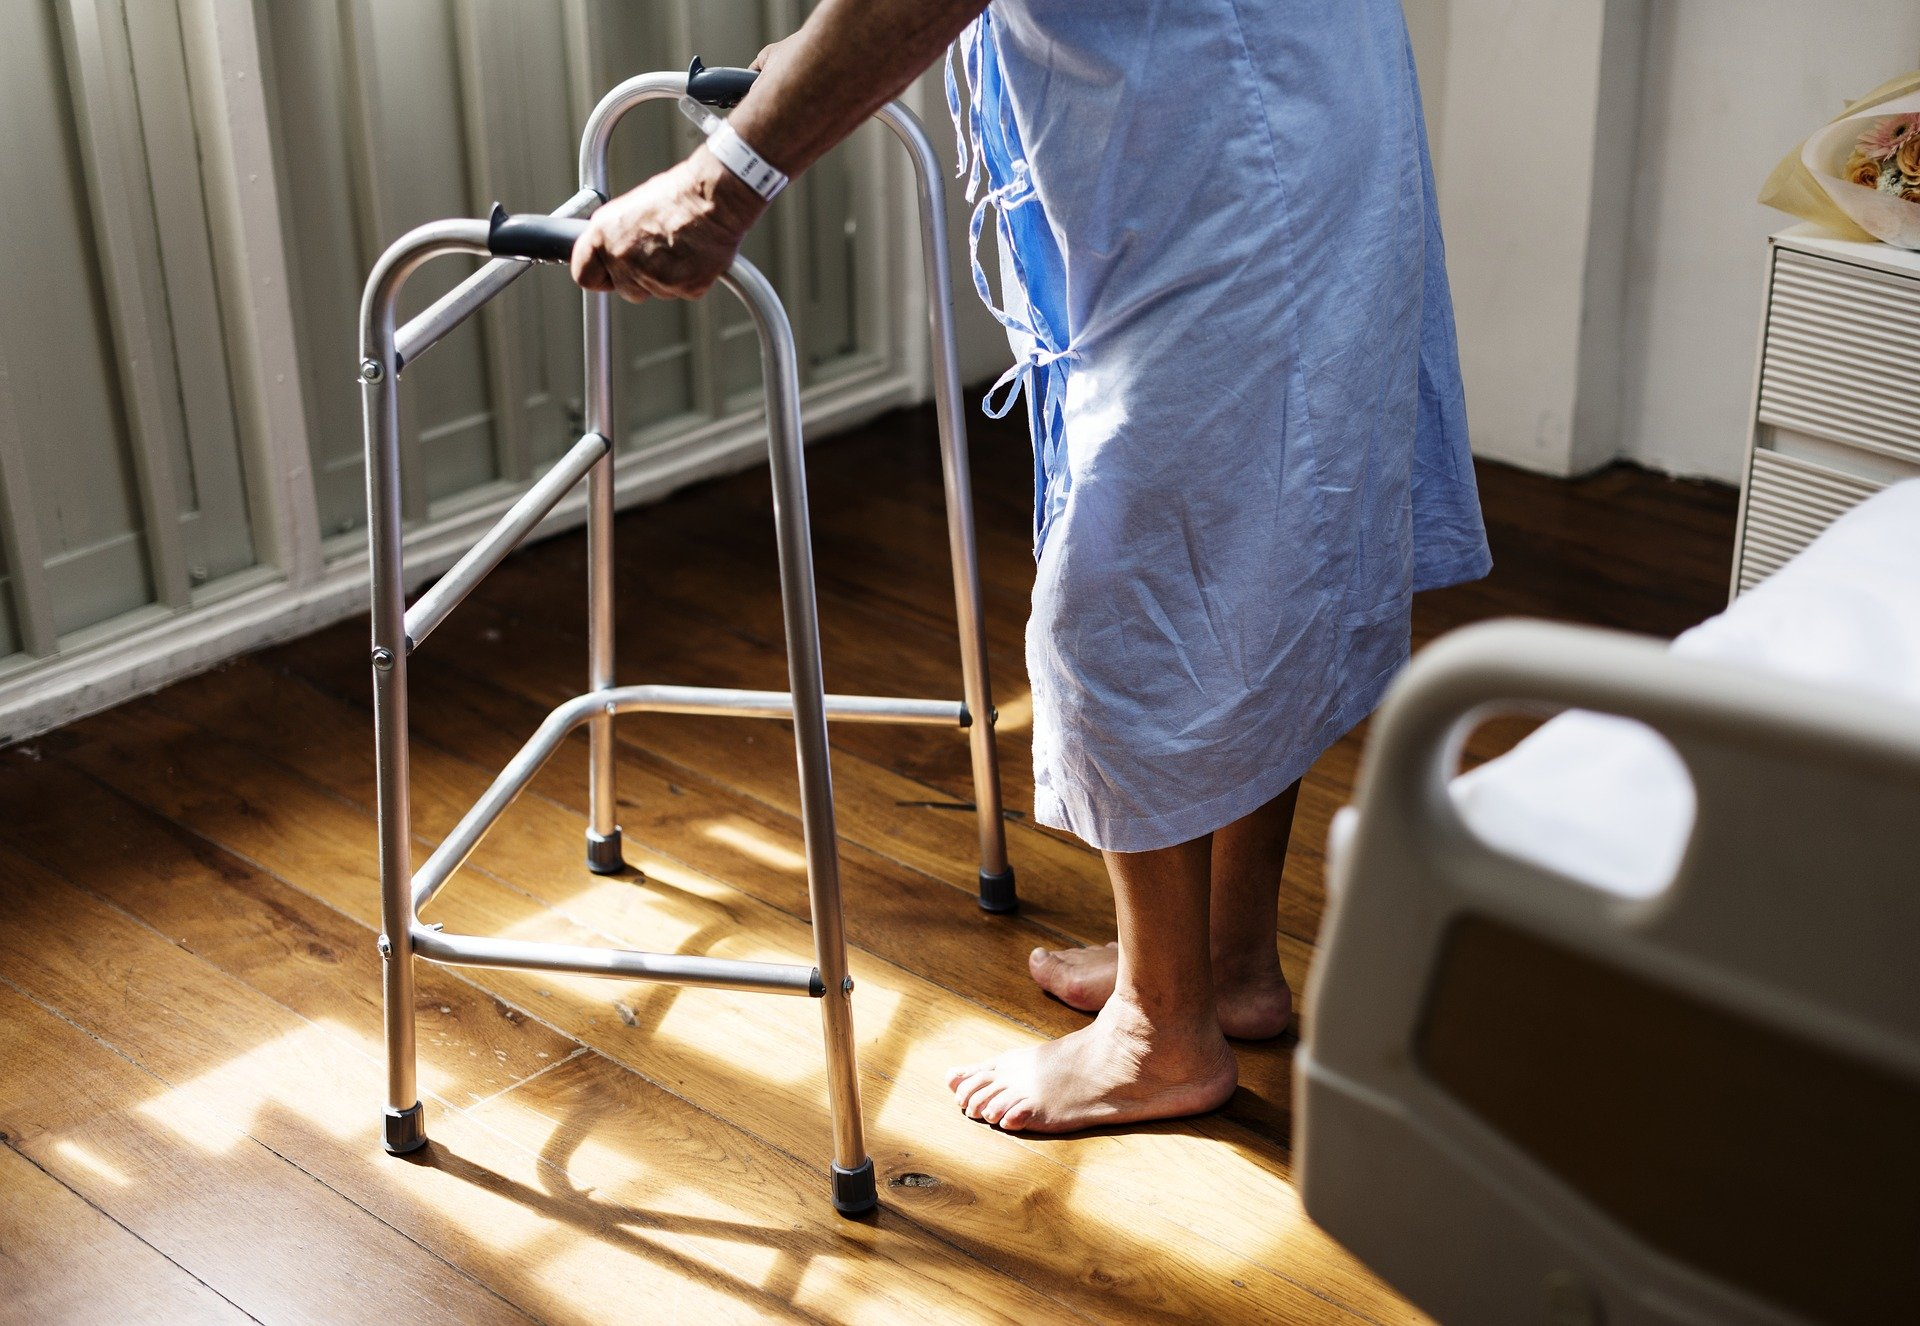 Senior man using a walker. | Source: rawpixel/Pixabay